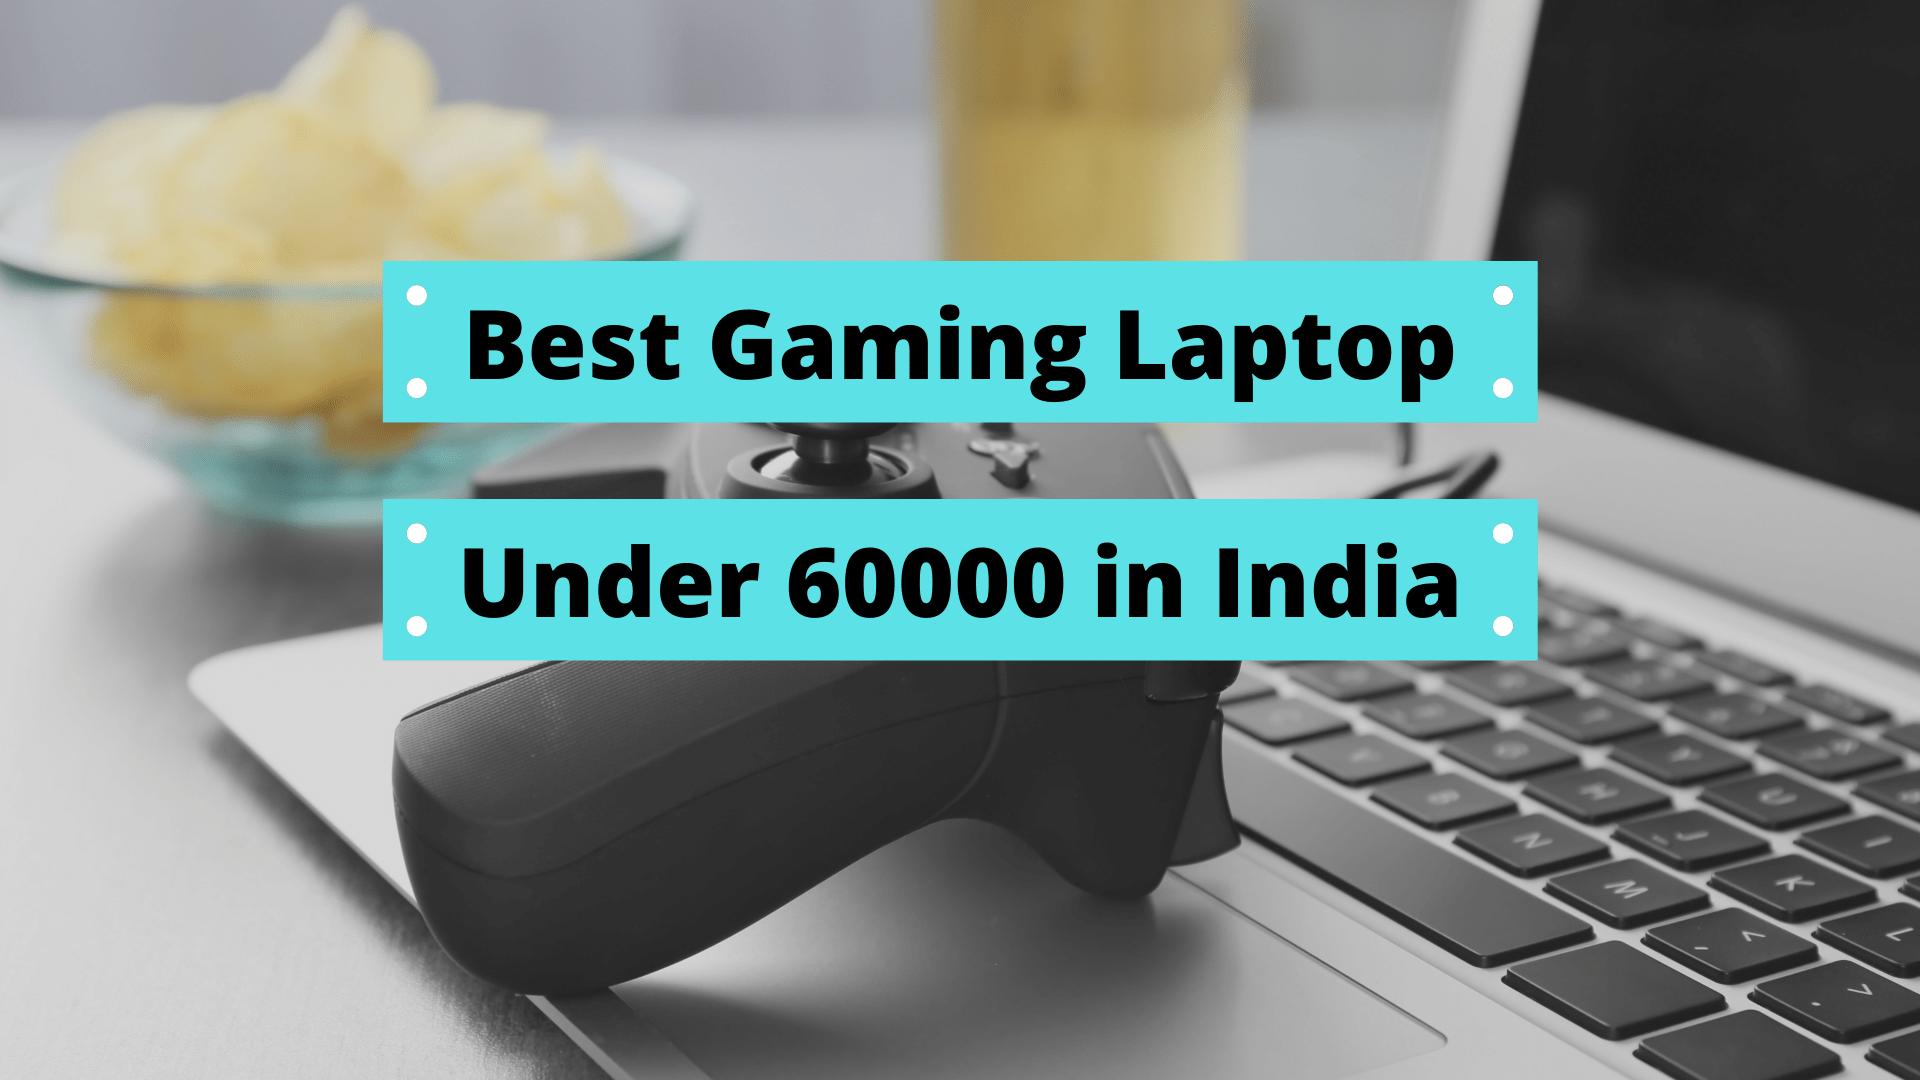 Top 7 Best Gaming Laptop Under 60000 in India (2020)